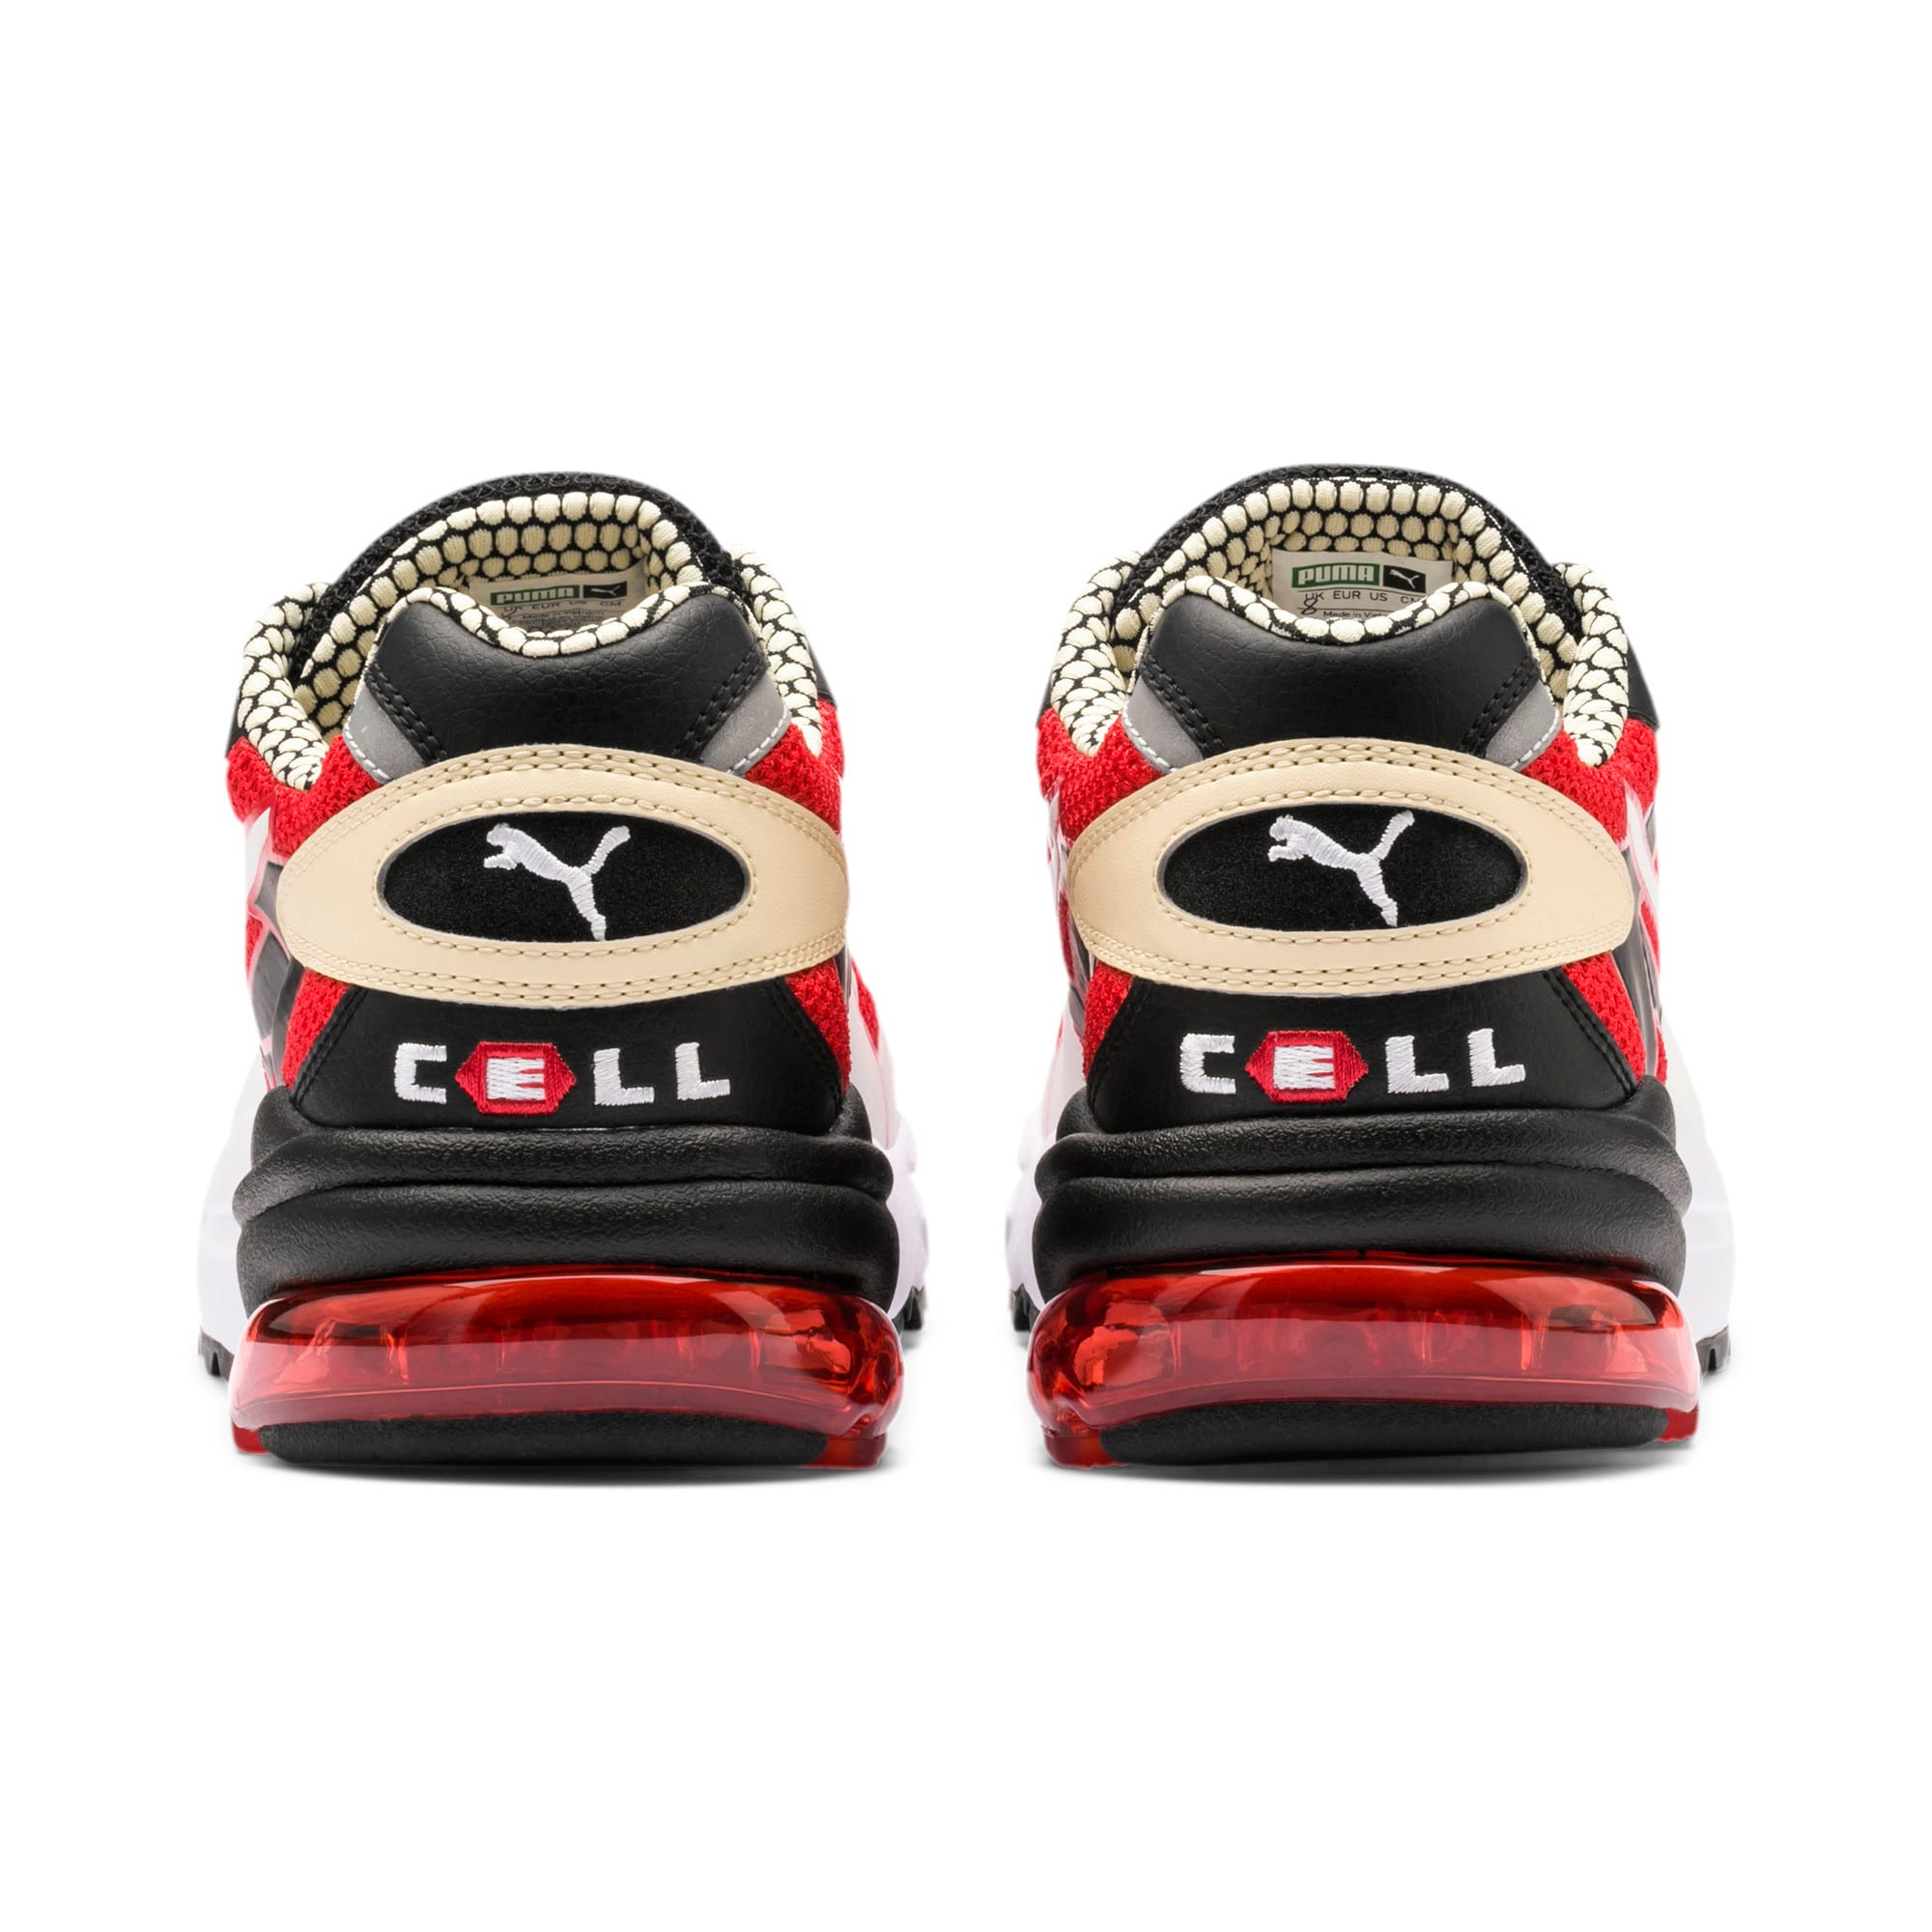 Thumbnail 4 of CELL Alien Kotto Sneakers, High Risk Red-Puma Black, medium